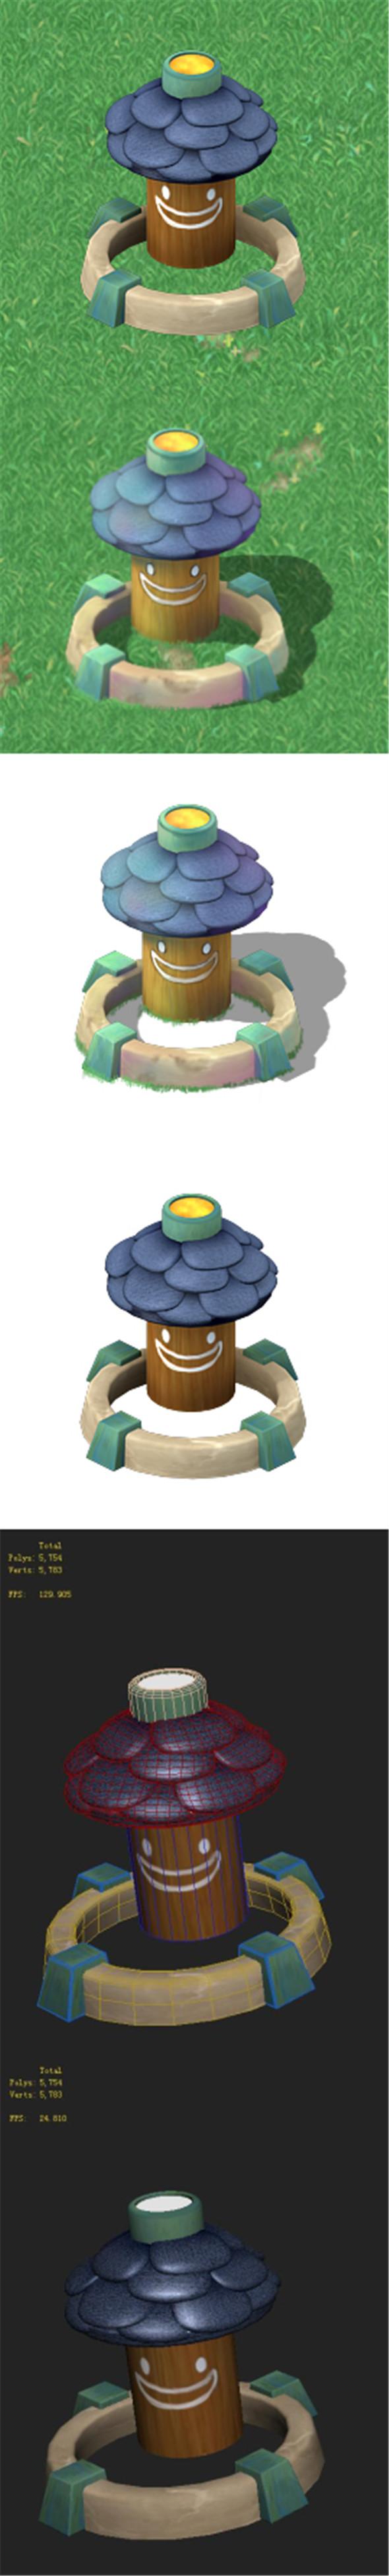 Cartoon version - small wave flower garden - 3DOcean Item for Sale